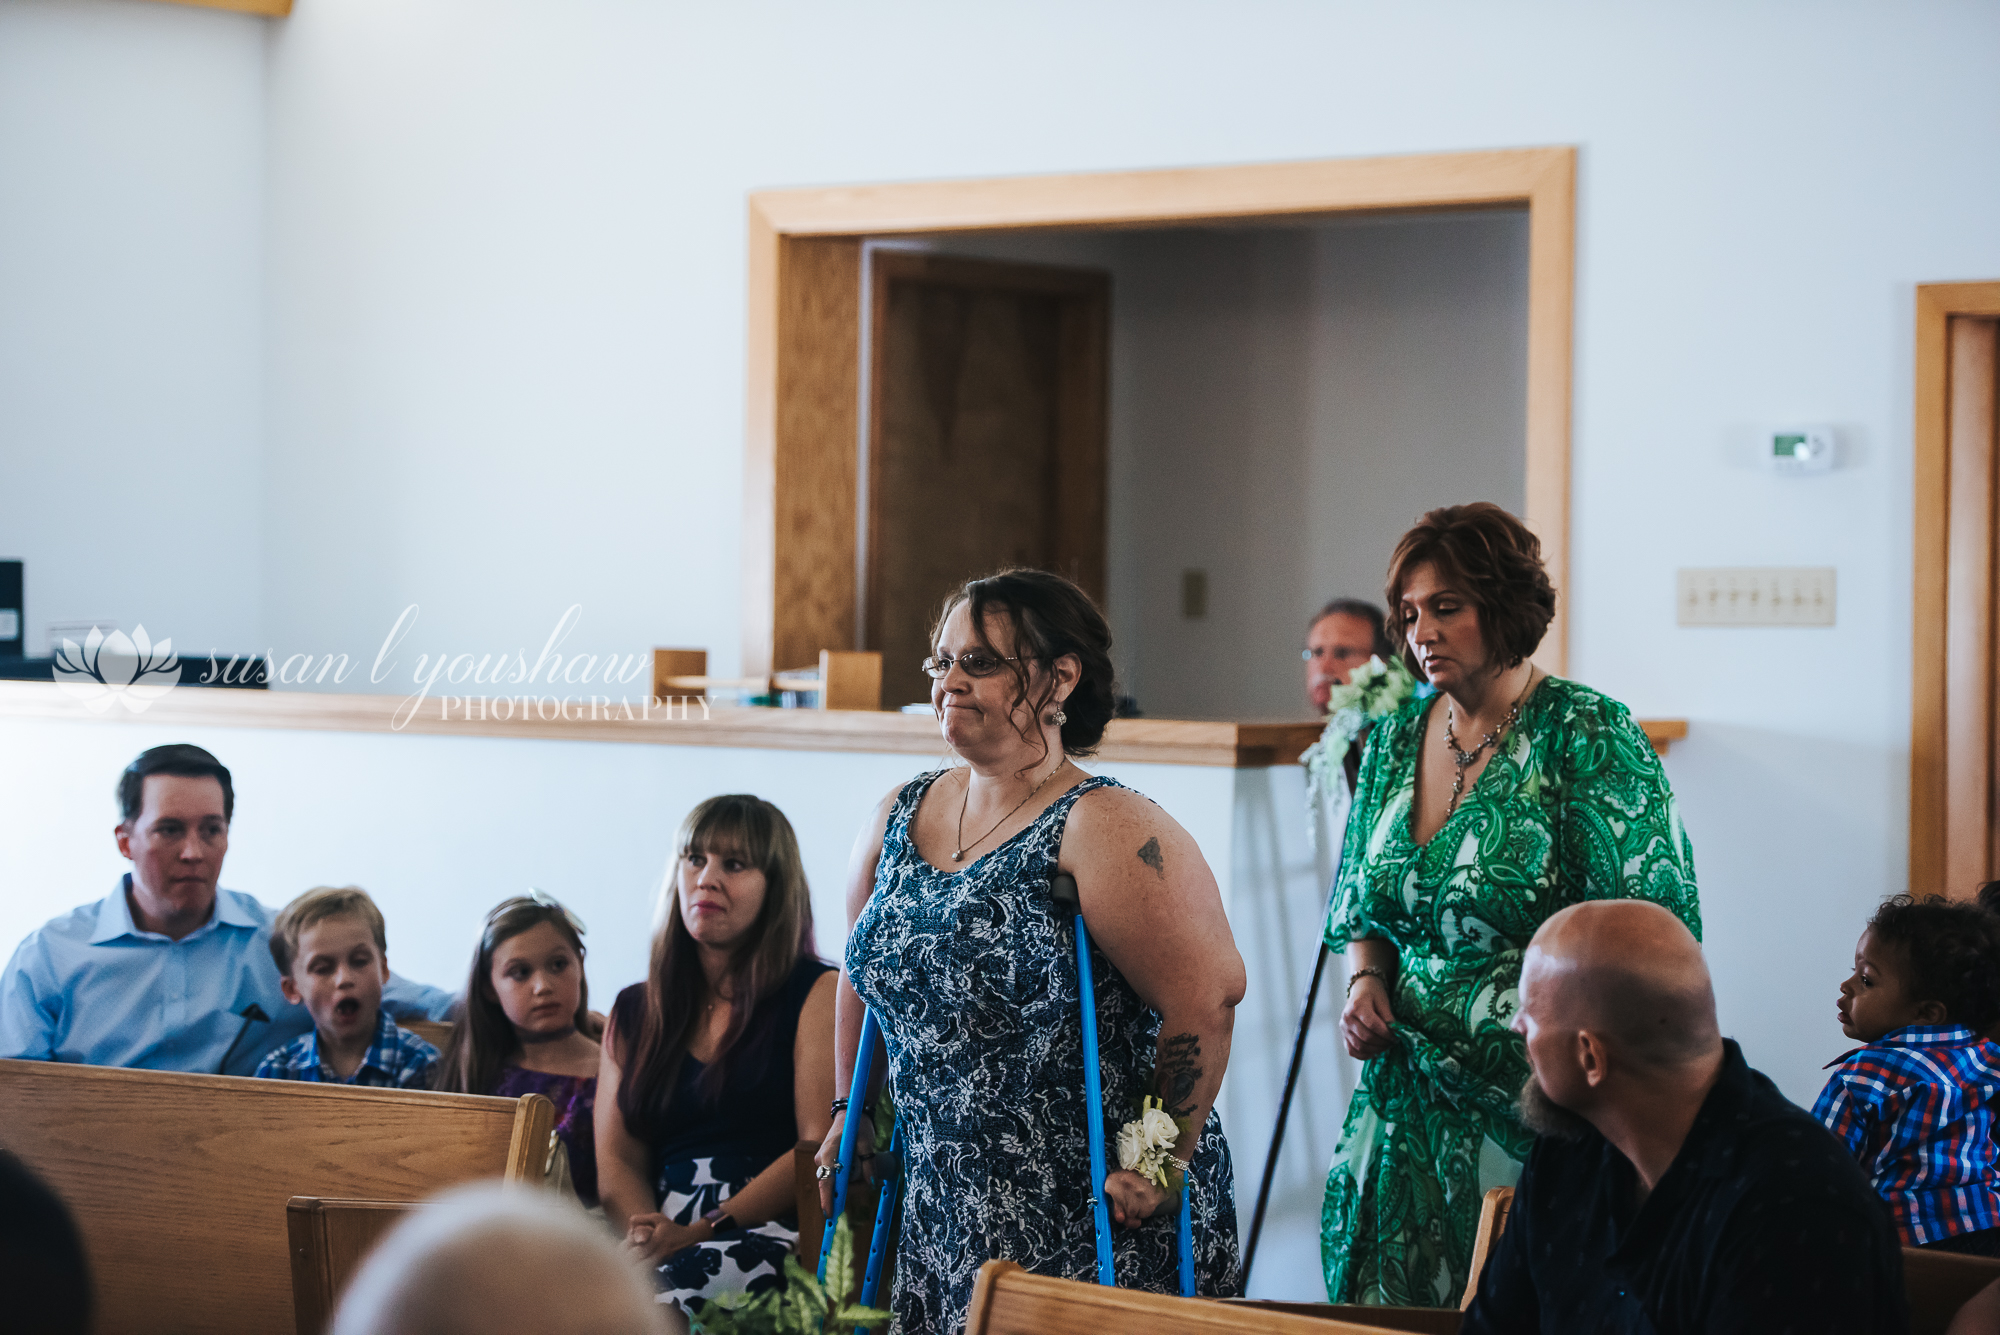 Katelyn and Wes Wedding Photos 07-13-2019 SLY Photography-49.jpg